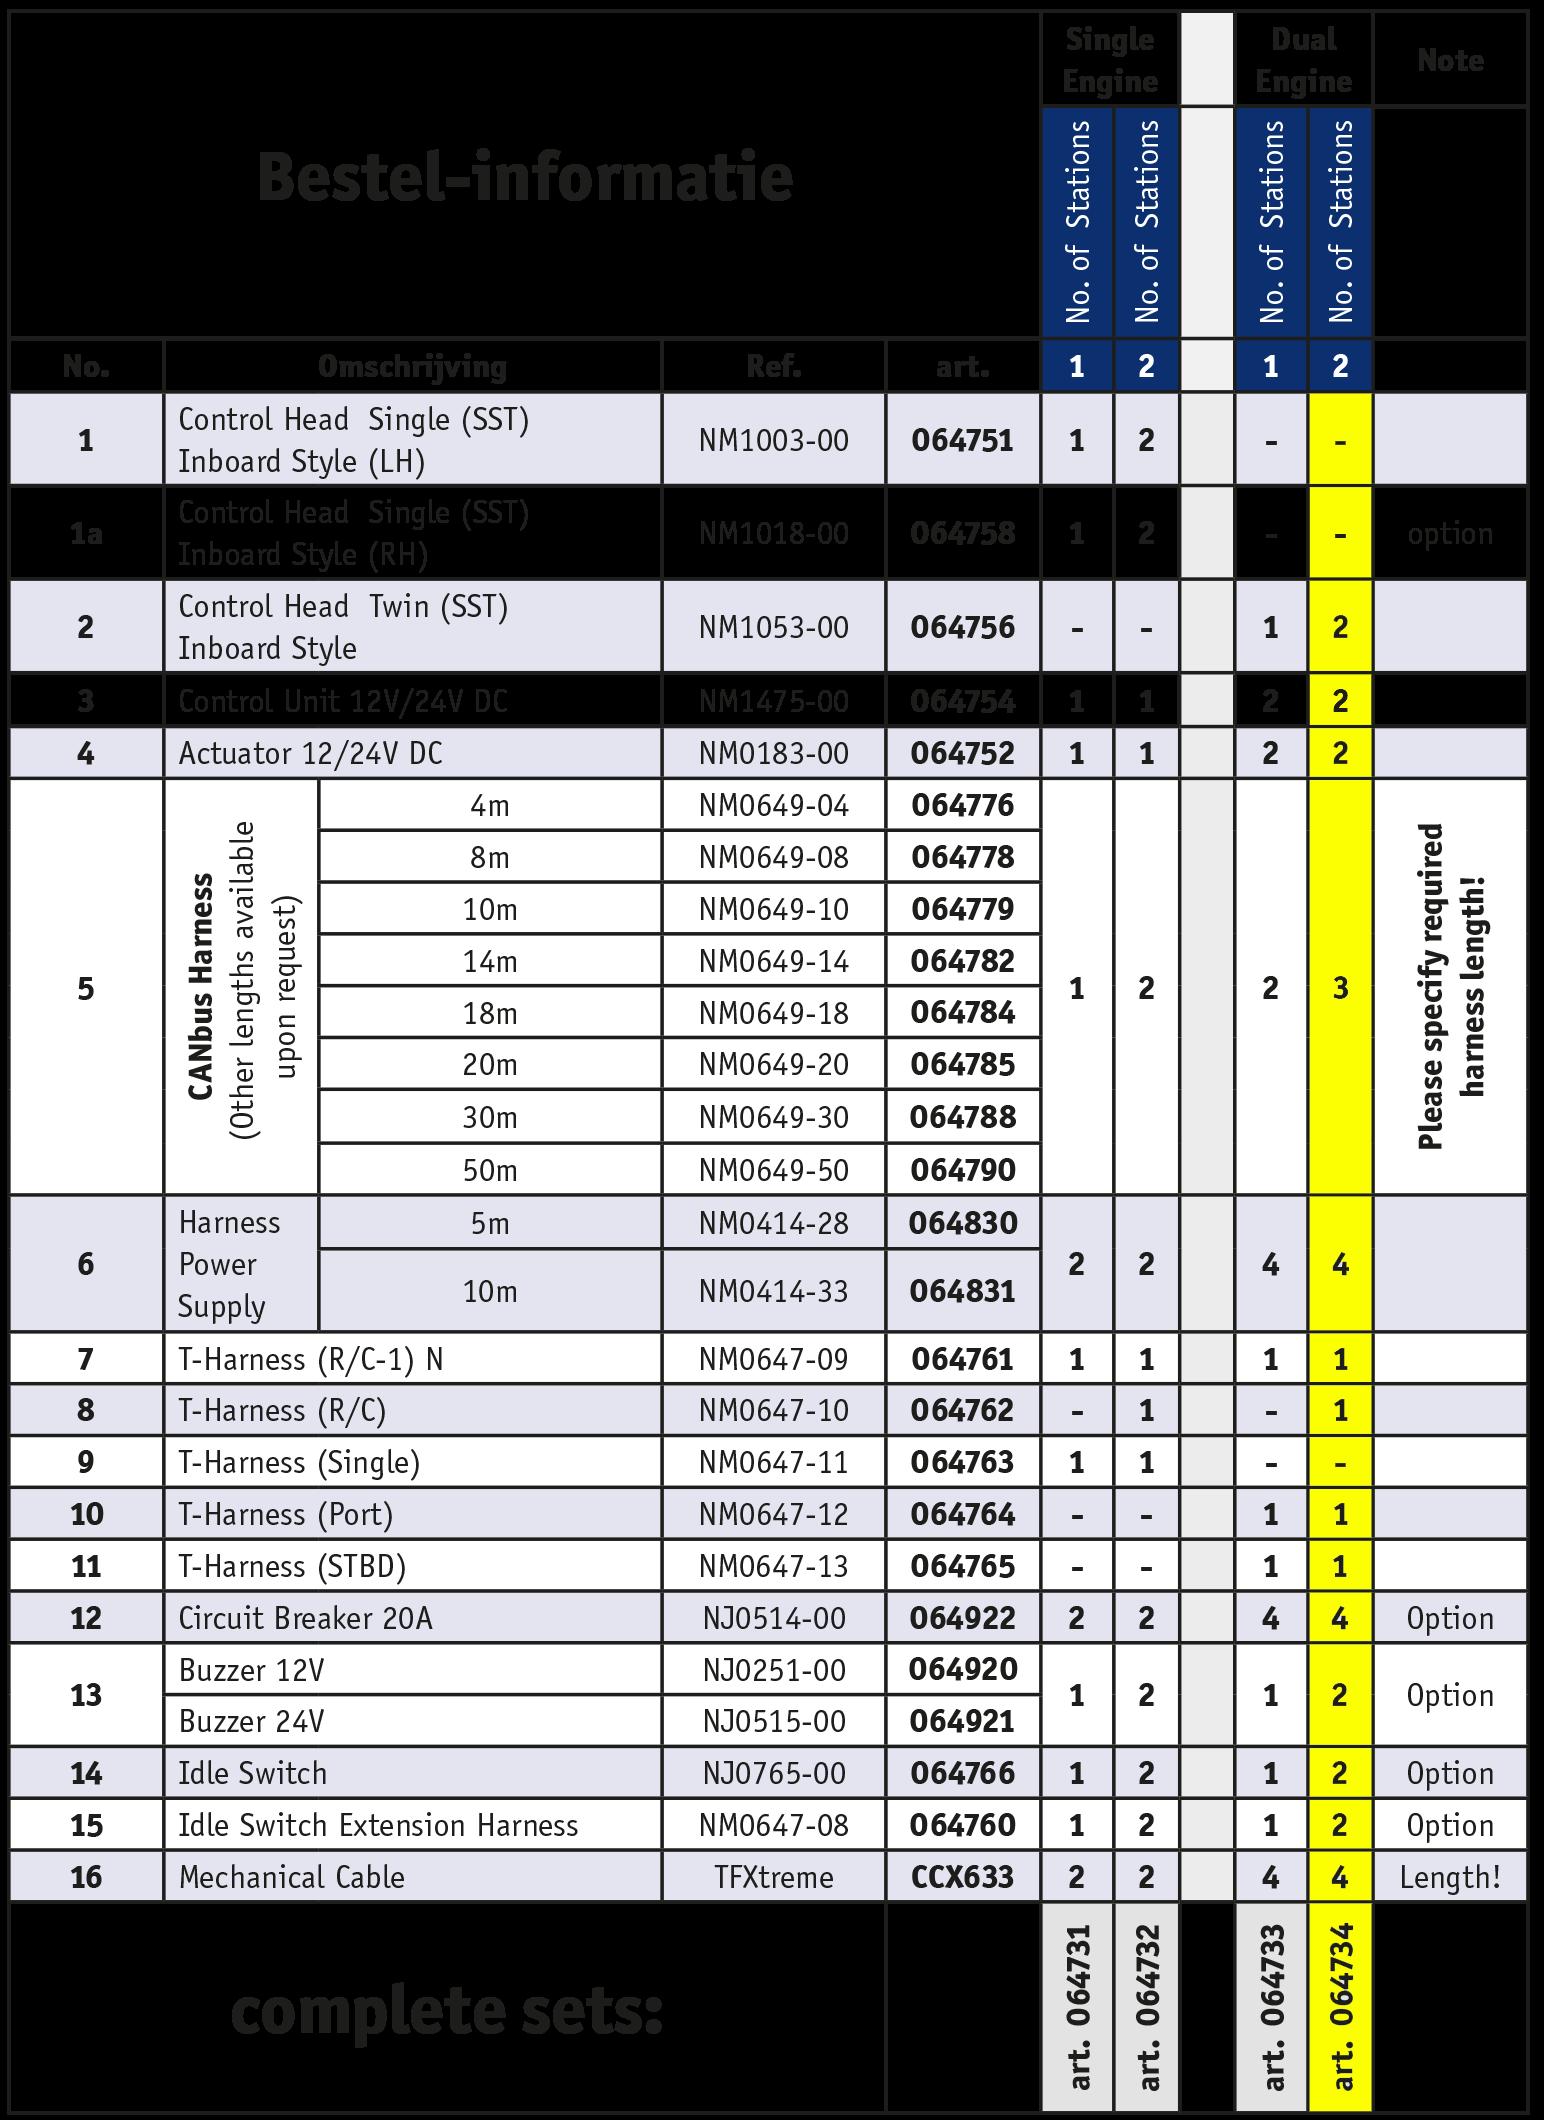 ke-4-canbus-elektronische-motorbedienung-fur-innenborder-2-motoren-2-steuerstande